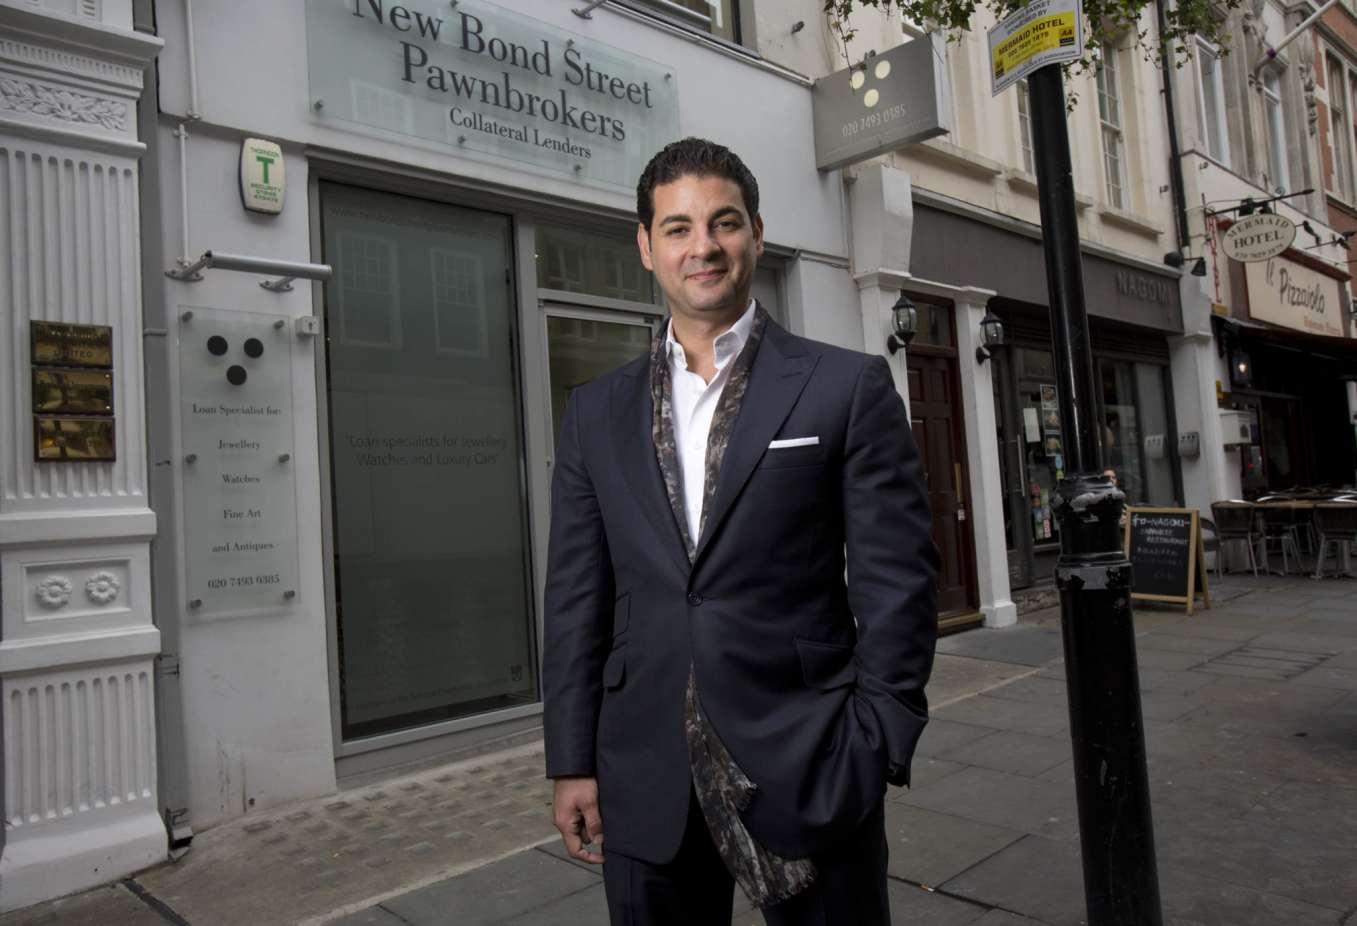 David Sonnenthal, New Bond Street Pawnbrokers